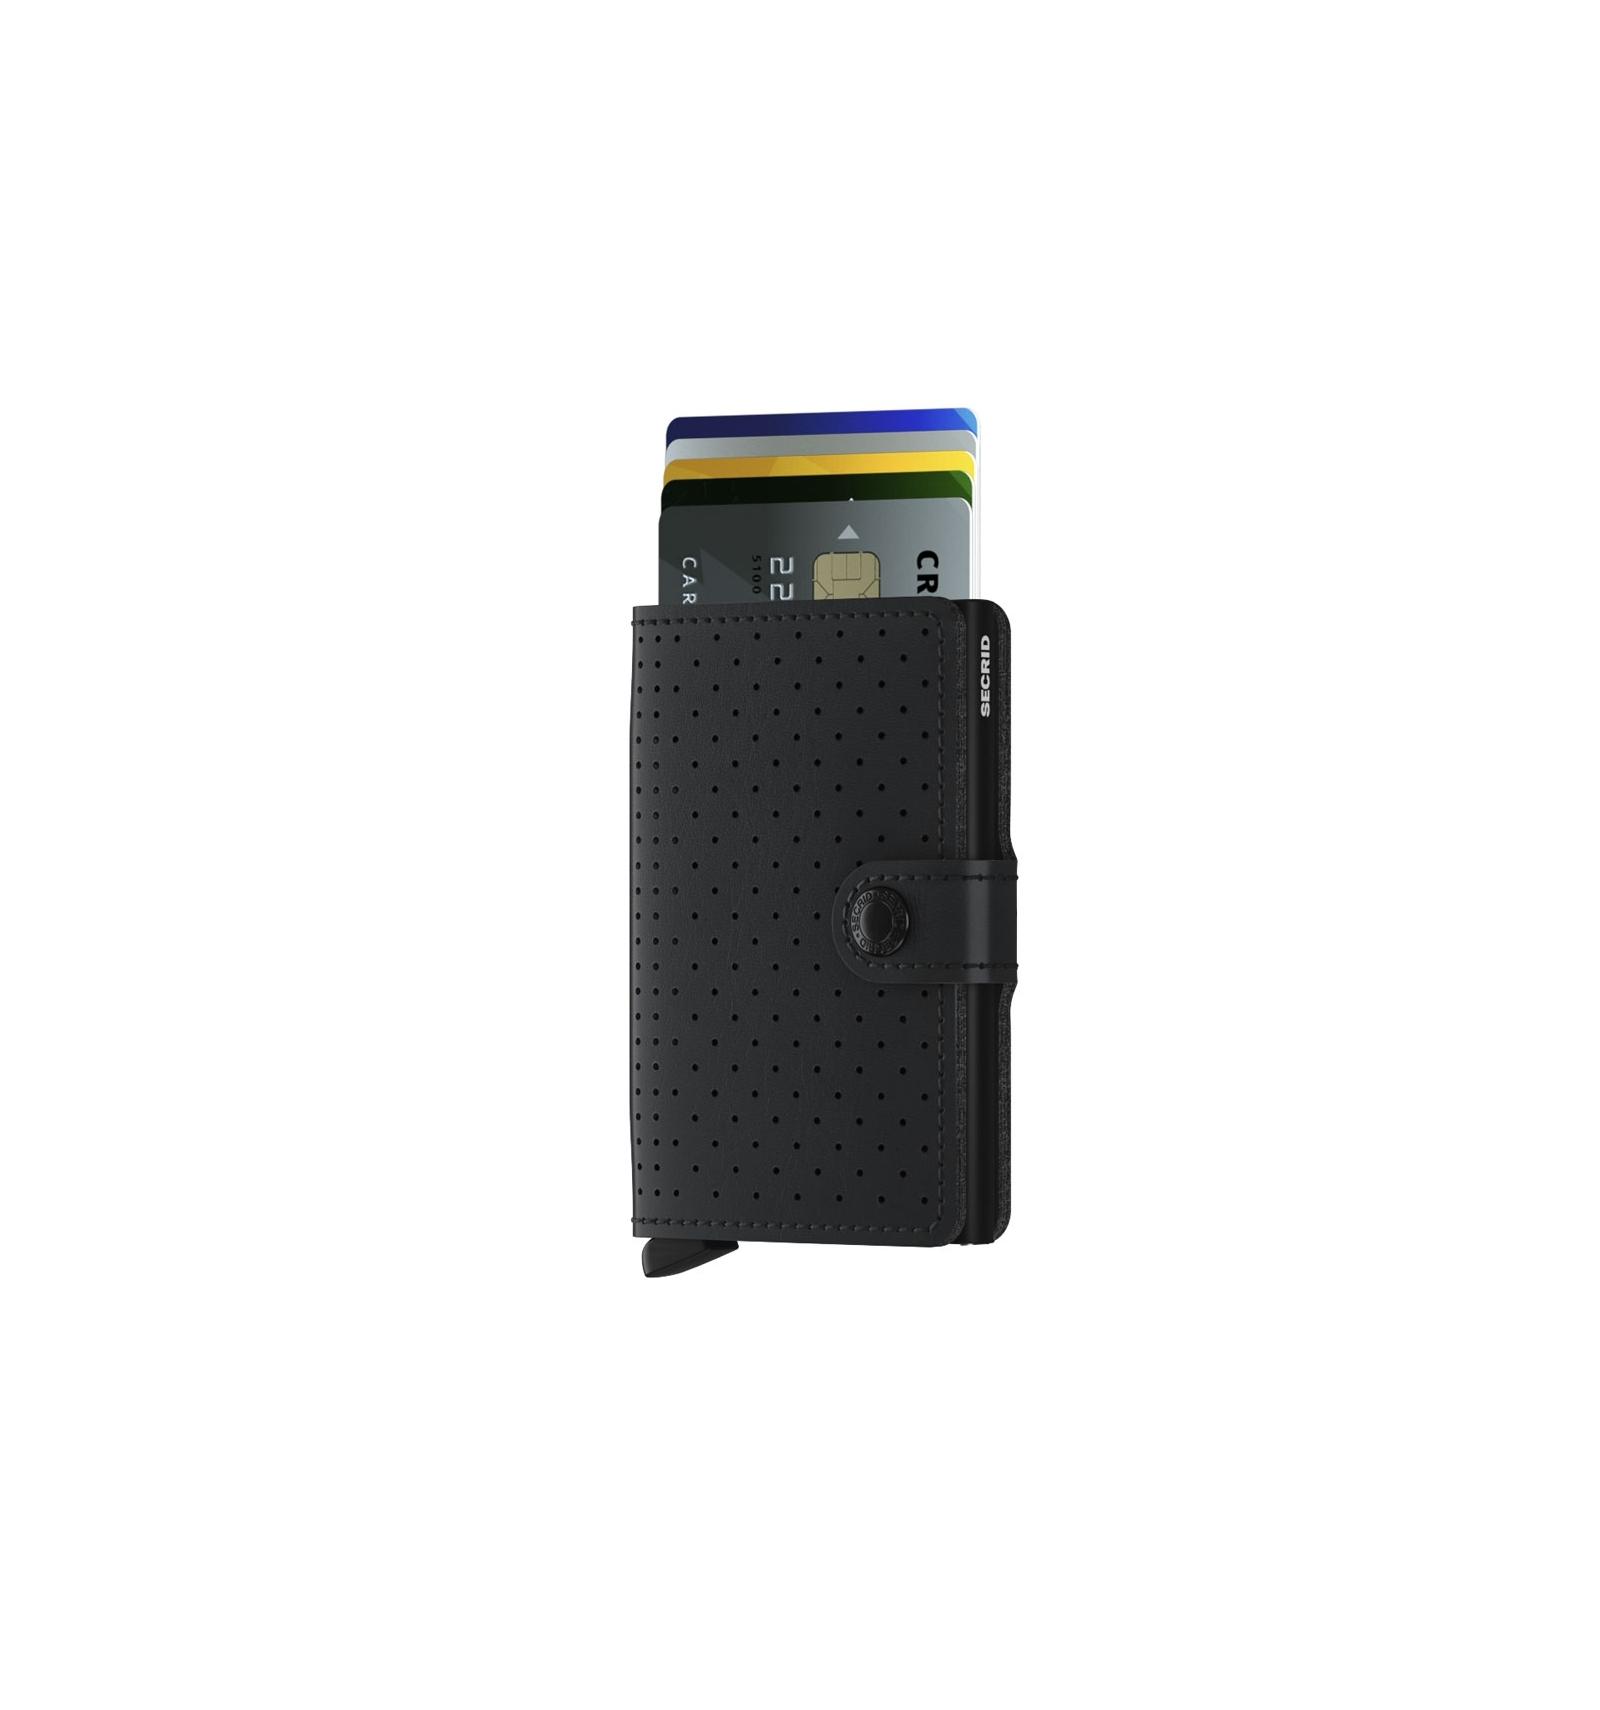 https://osez-sophie.com/4564-thickbox_default/porte-carte-secrid-aluminium-miniwallet-cuir-noir-perfore.jpg